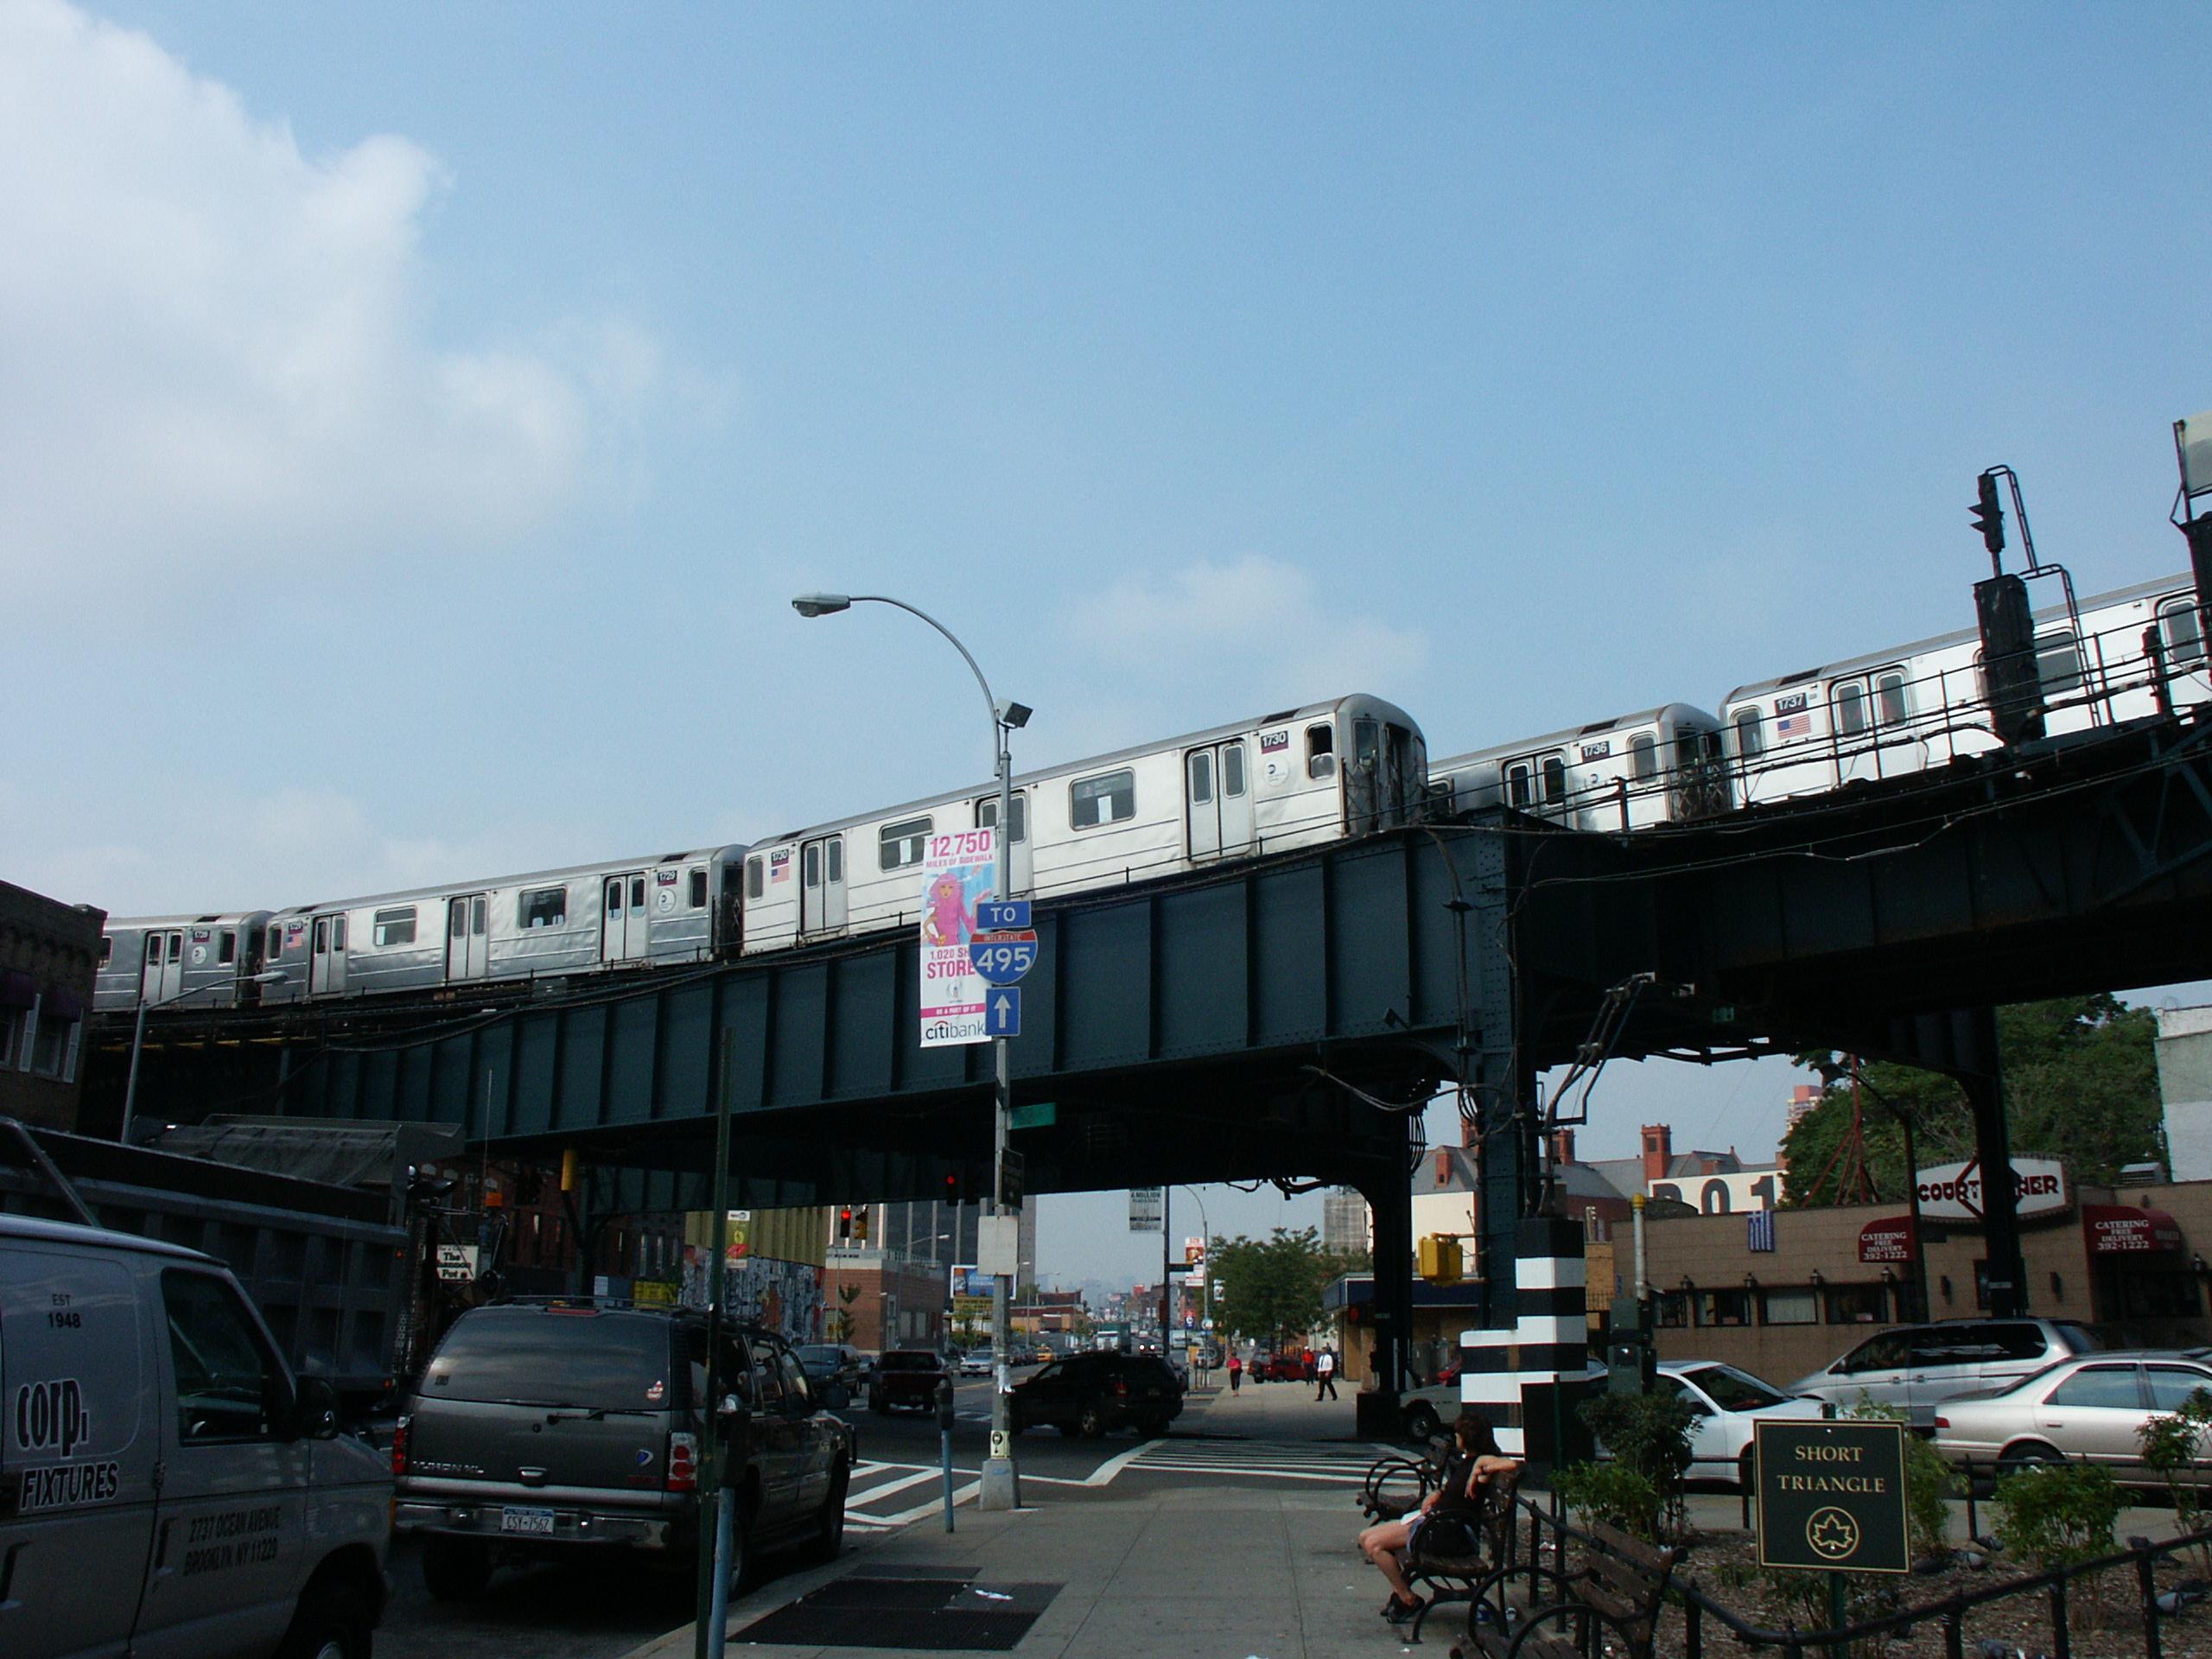 Matro jadące po Brooklynie nad ziemią